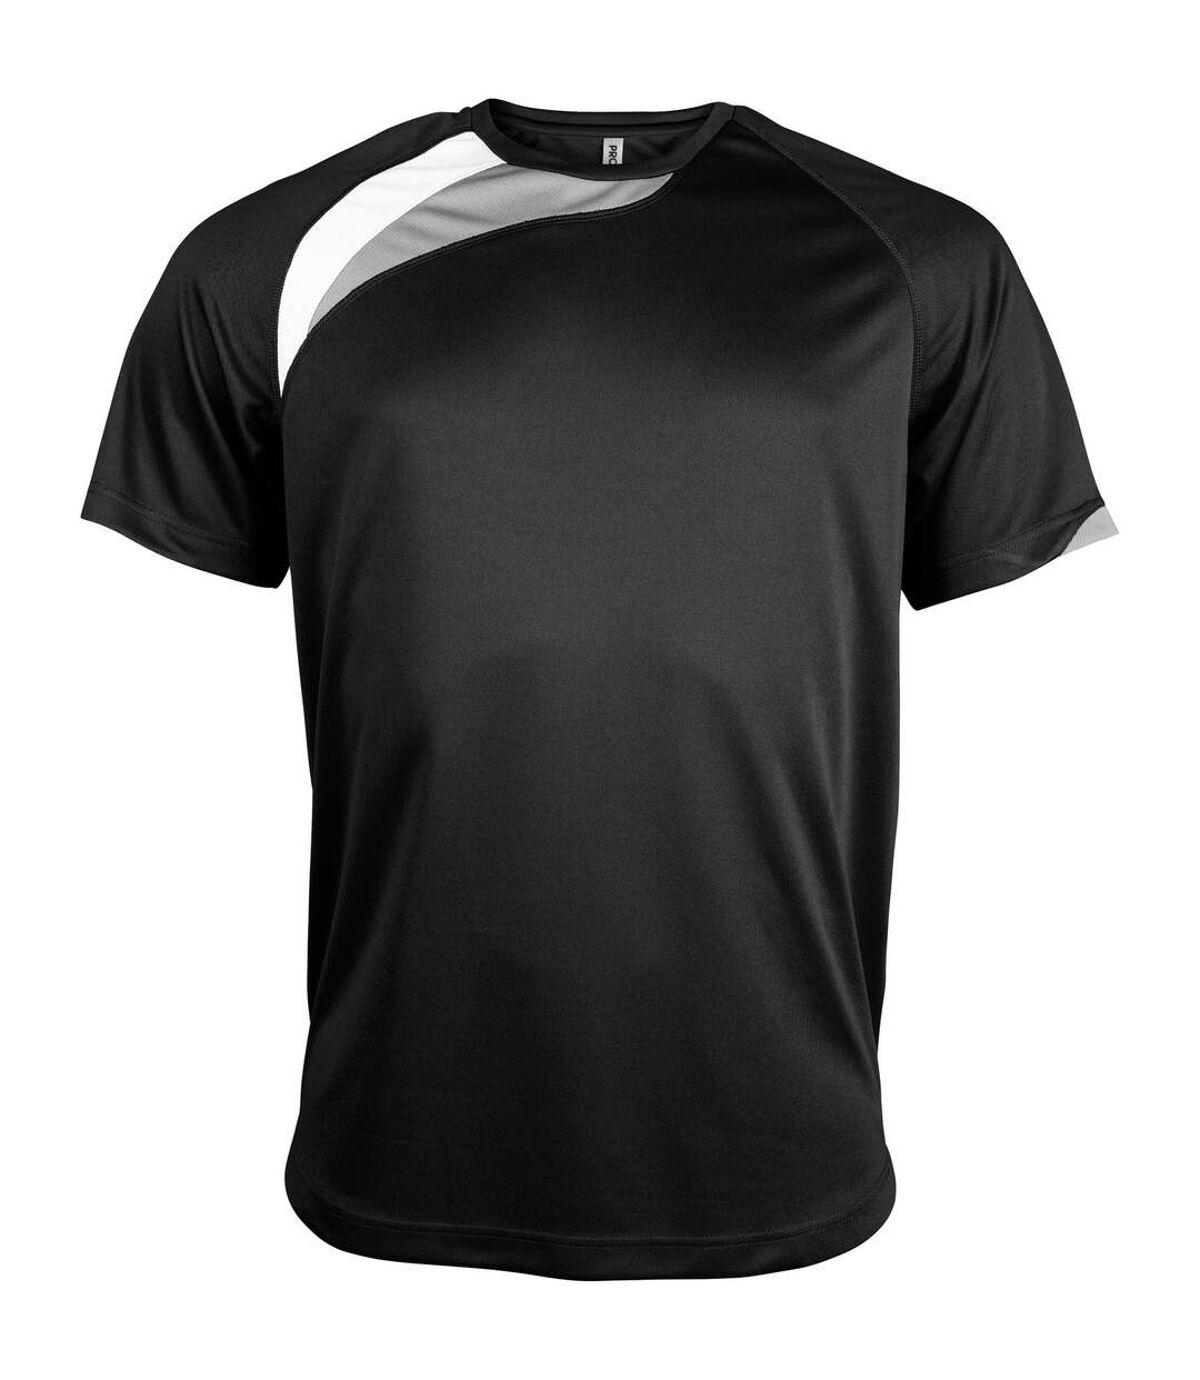 Kariban Proact Mens Short Sleeve Crew Neck Sports T-Shirt (Black/ White/ Storm Grey) - UTRW4243